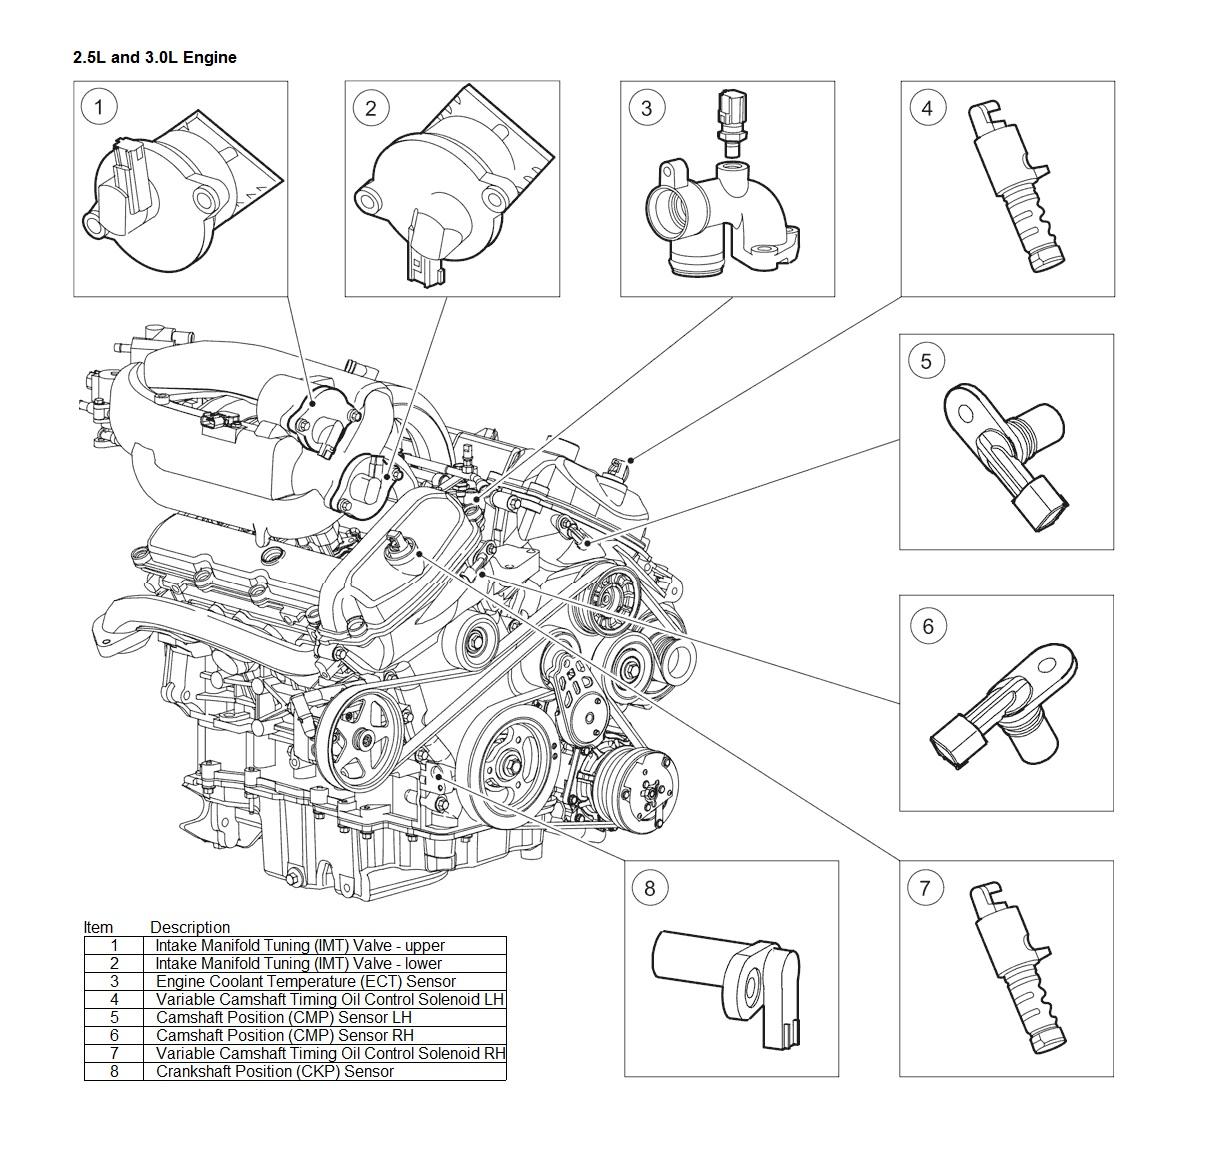 hight resolution of 2002 range rover wiring diagram 2002 get free image 2004 range rover hse engine diagram 2004